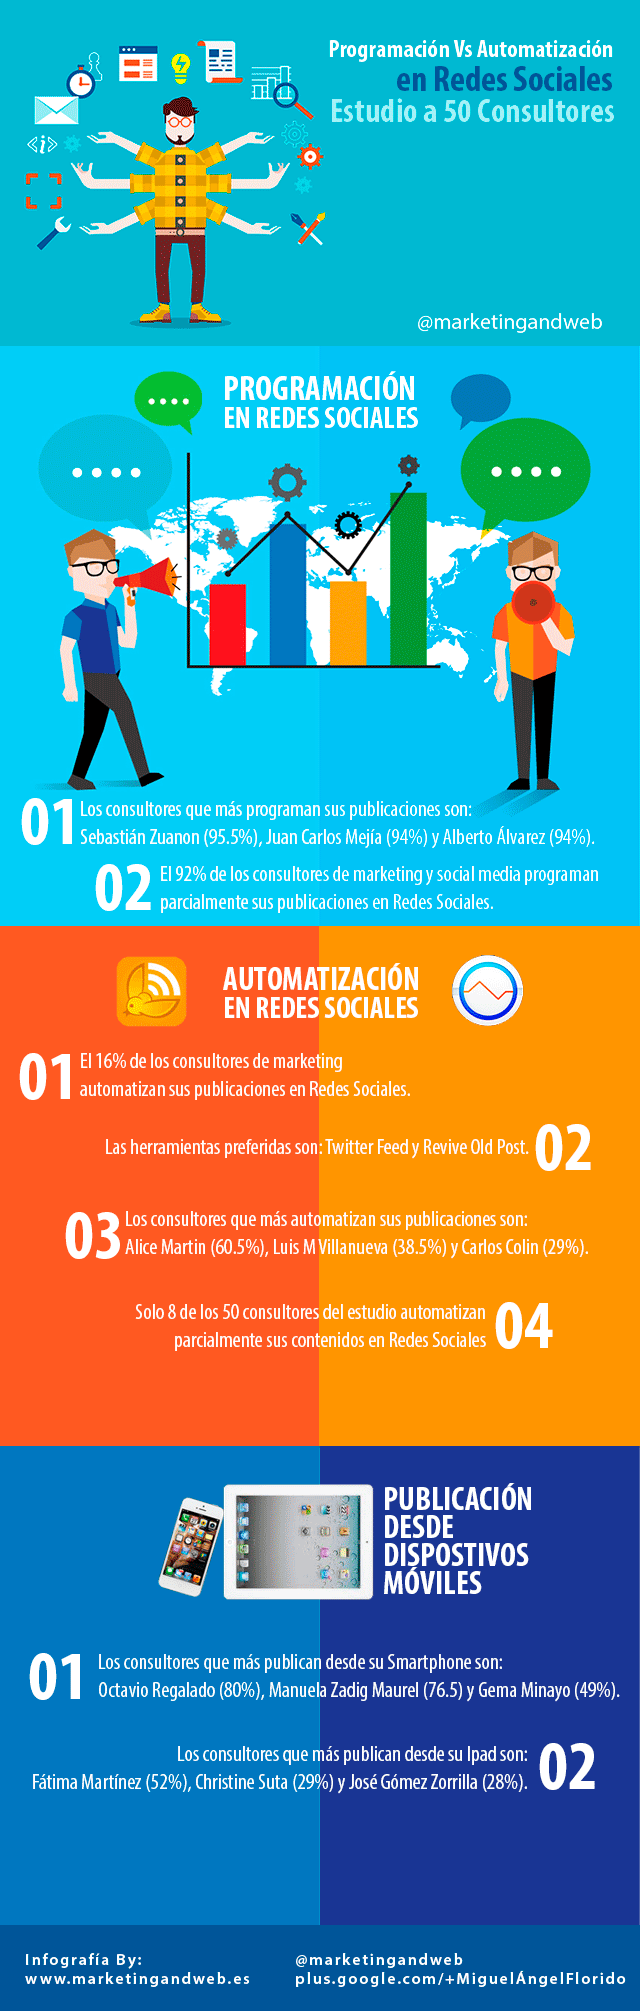 Automatización Vs Programación en Redes Sociales